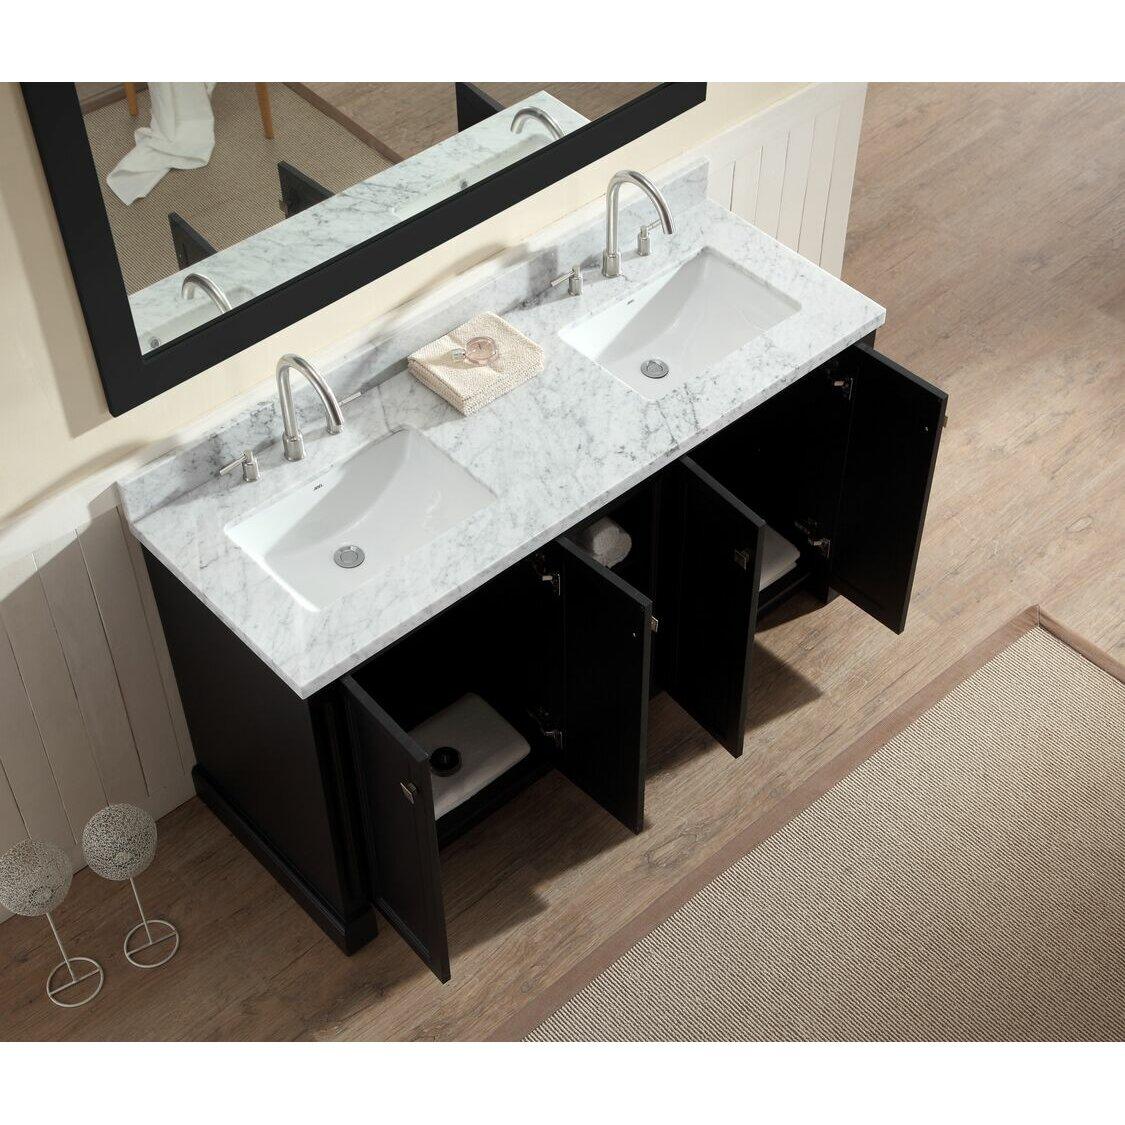 White Cultured Marble Integral Bathroom Vanity Top Mon 61 In X 22